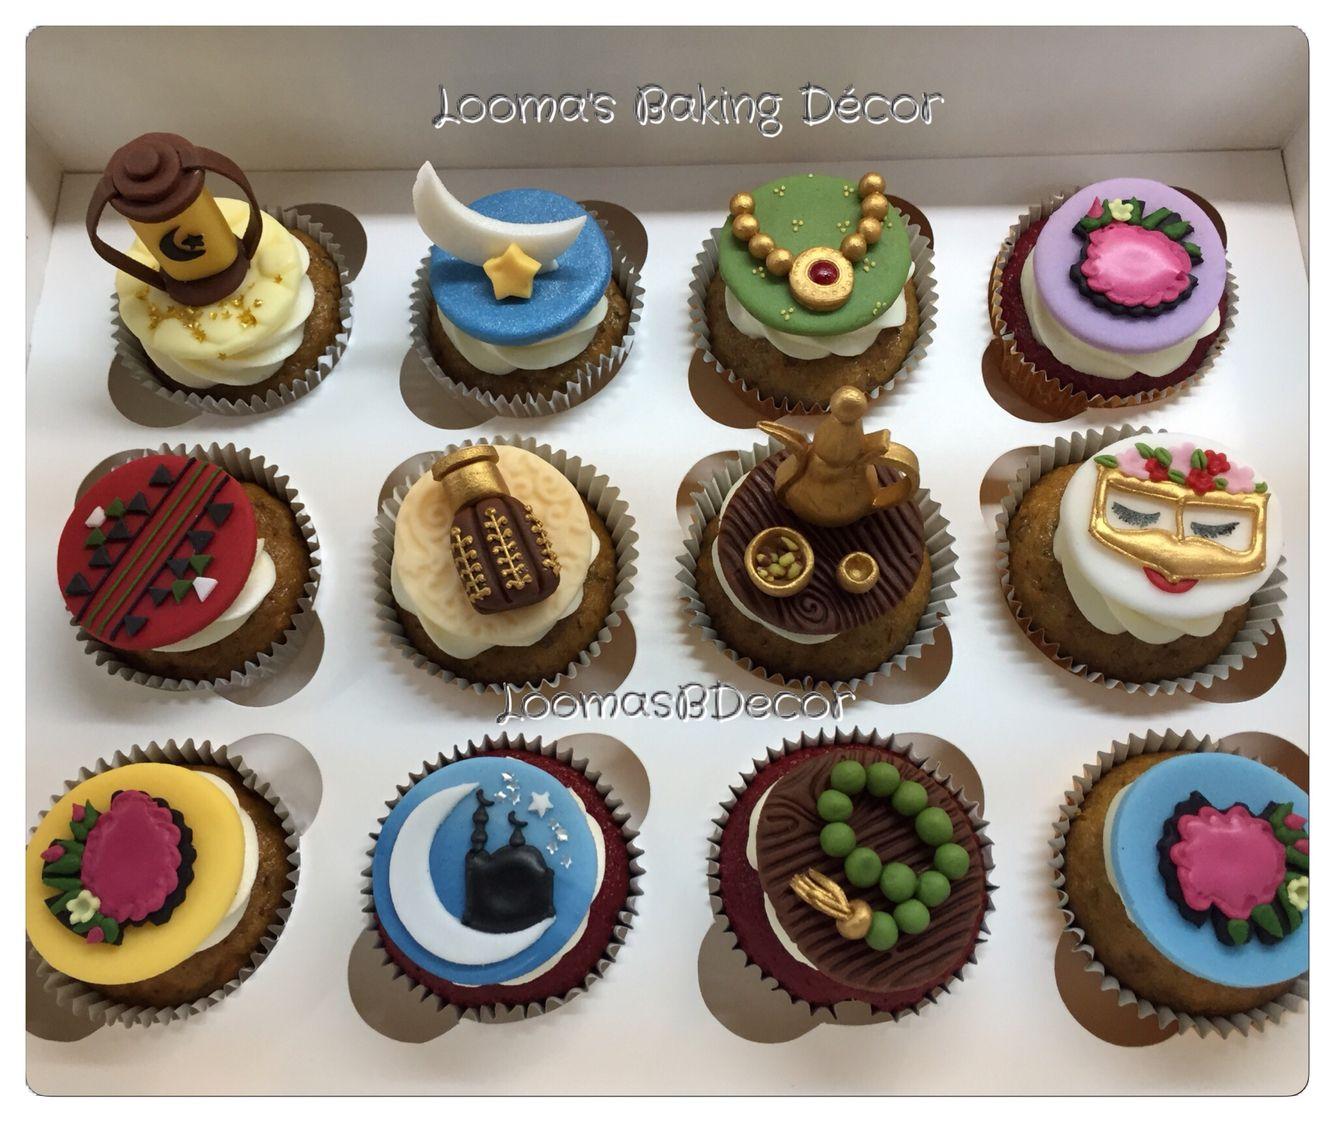 My Ramadan Cupcakes Collection كب كيك رمضان والقرقيعان من مجموعتي الخاصة Cupcake Cakes Cake Shop Baking